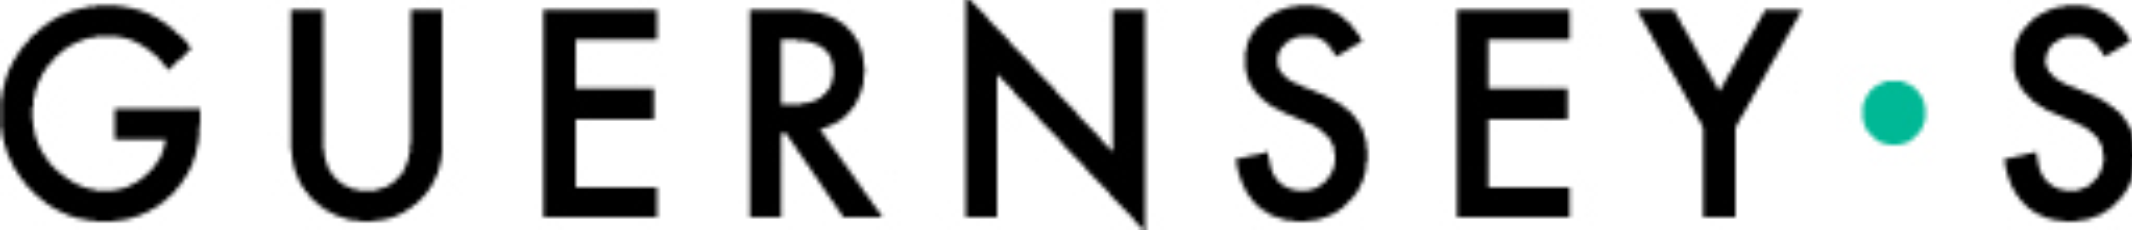 GuernseyLogo